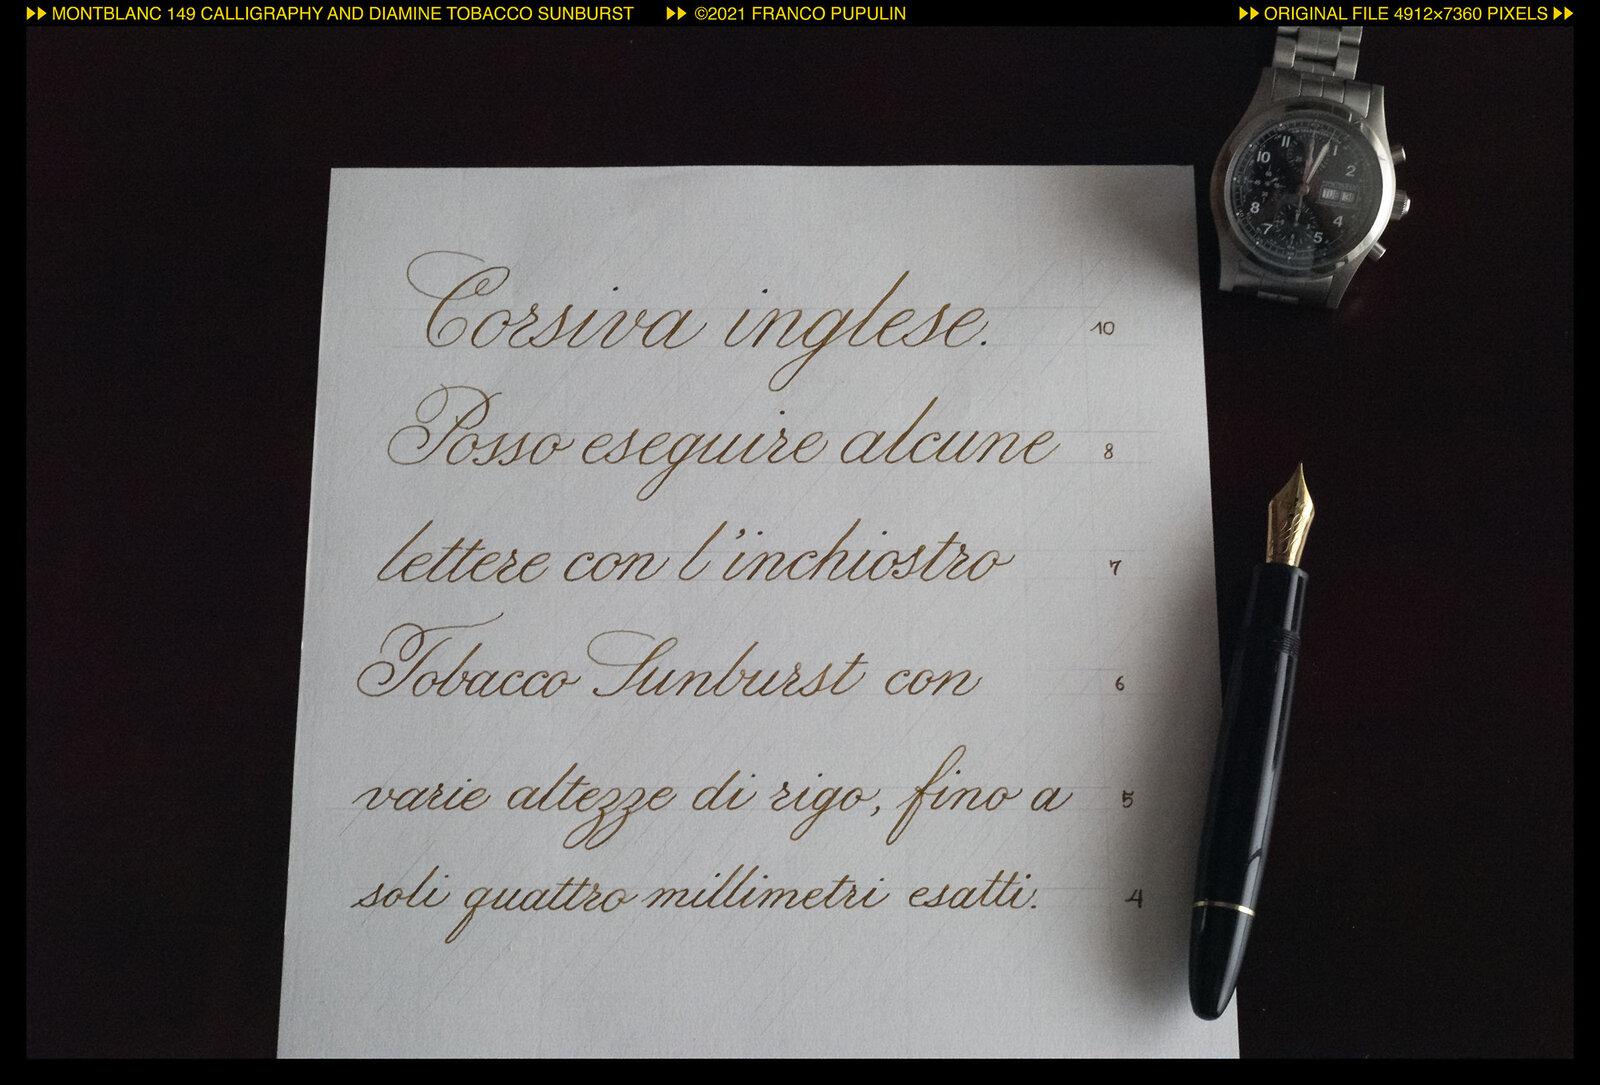 Montblanc 149 Calligraphy and Tobacco Sunburst ©FP.jpg